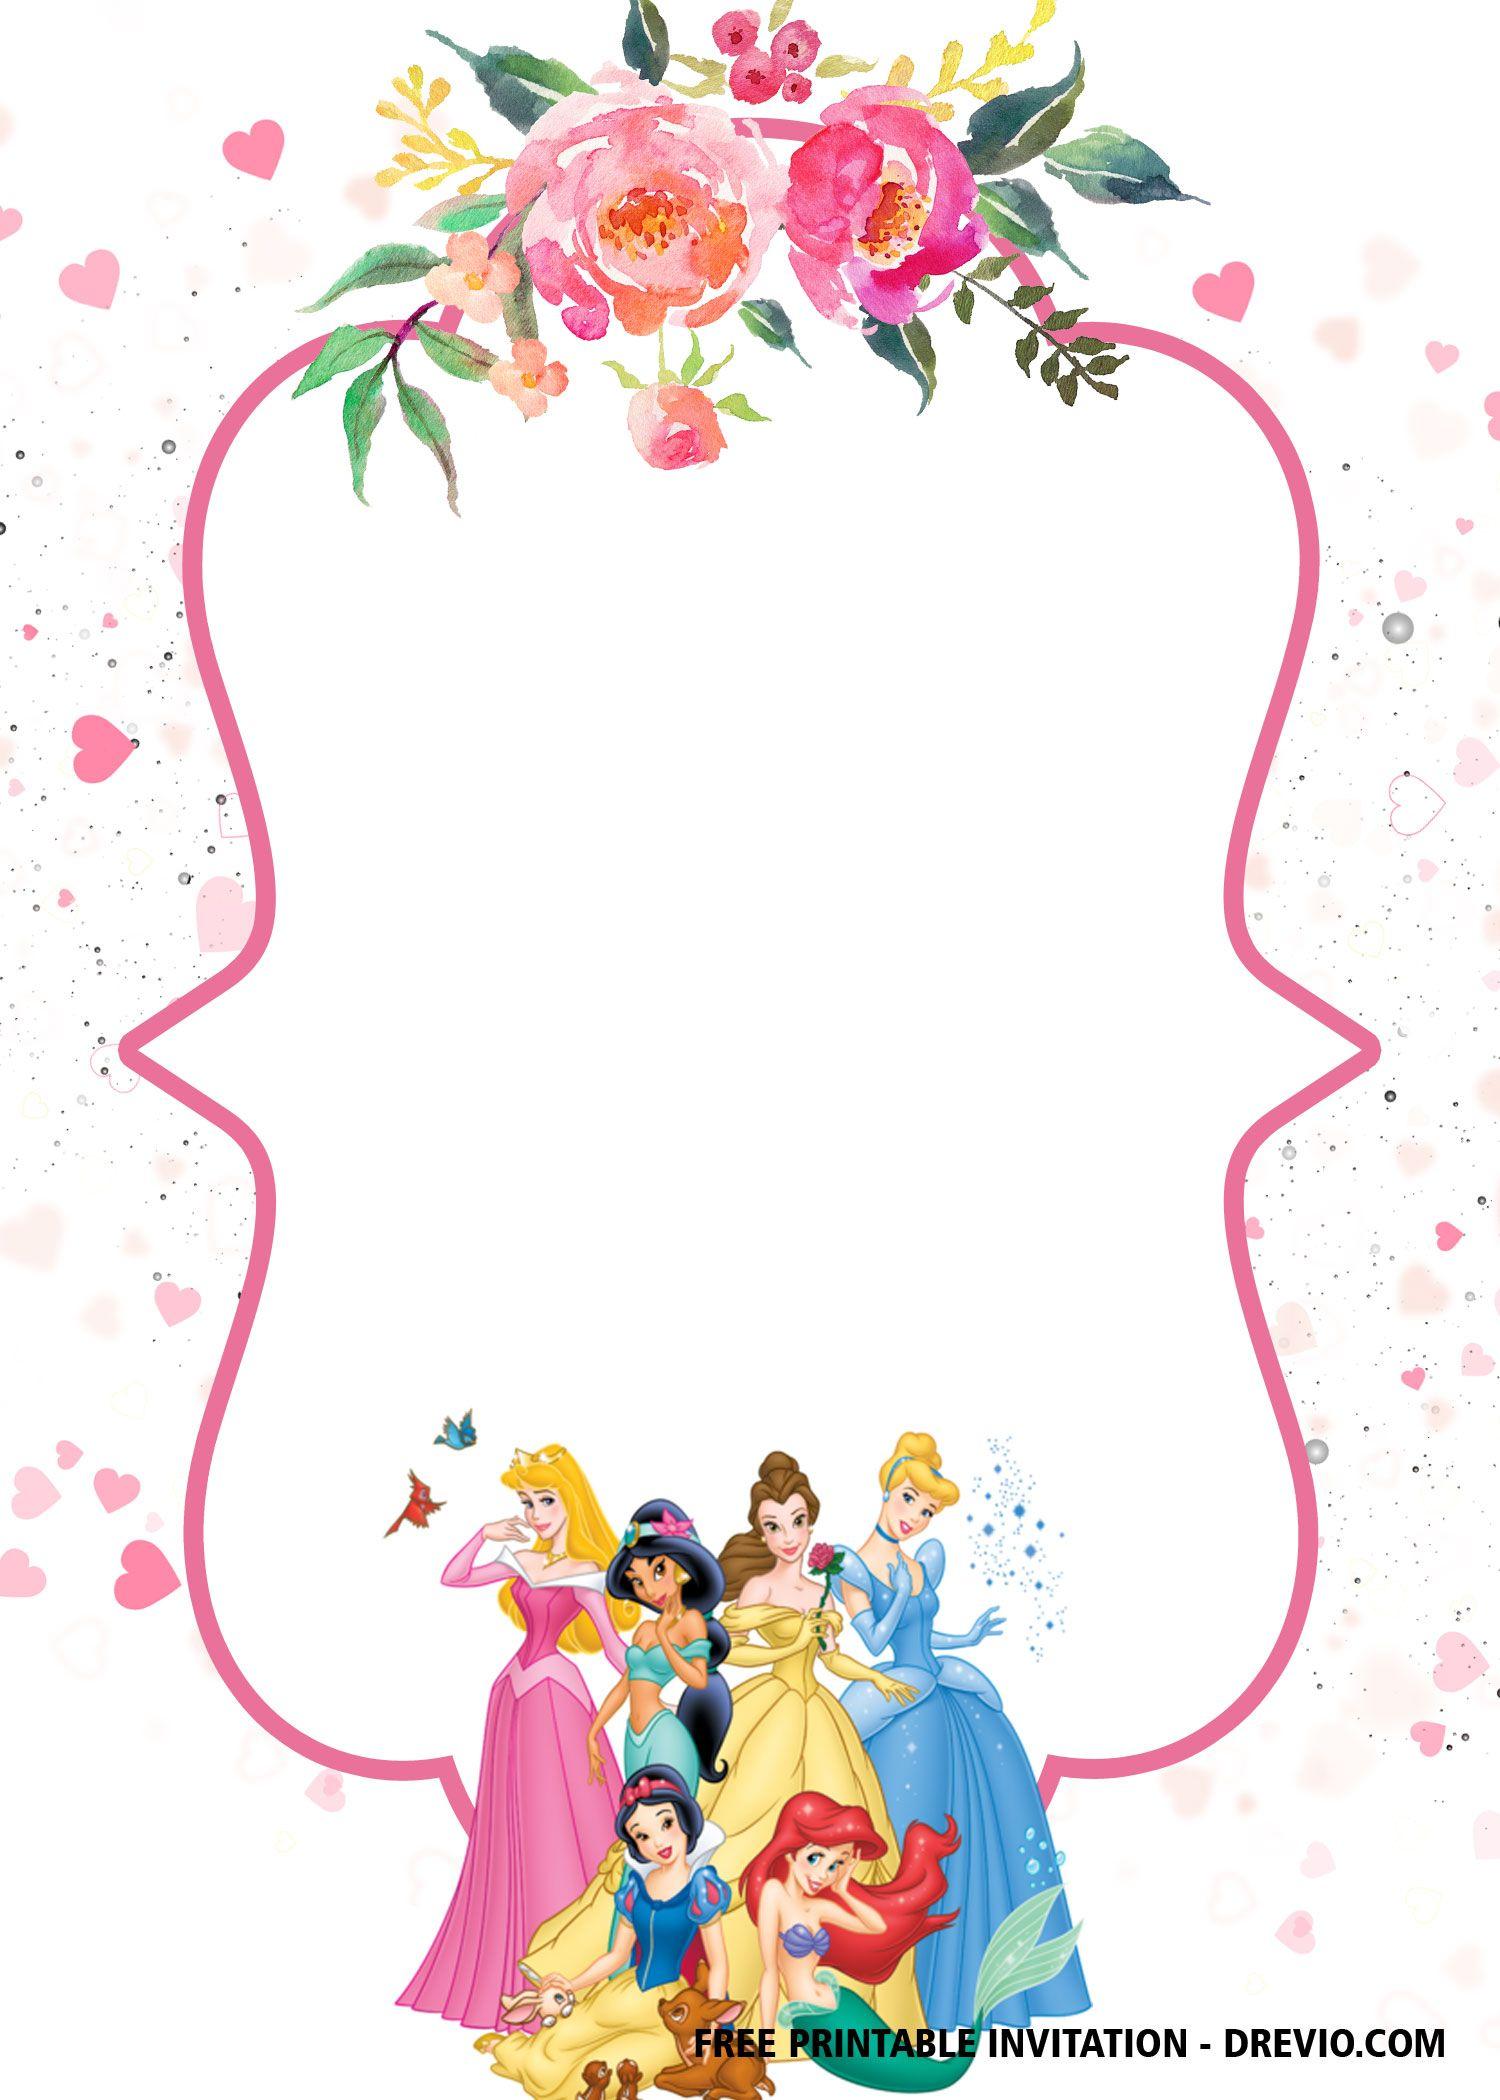 Free Disney Princess Invitation Template For Your Little Girl S Birthday Free Inv Disney Princess Invitations Princess Invitations Princess Party Invitations